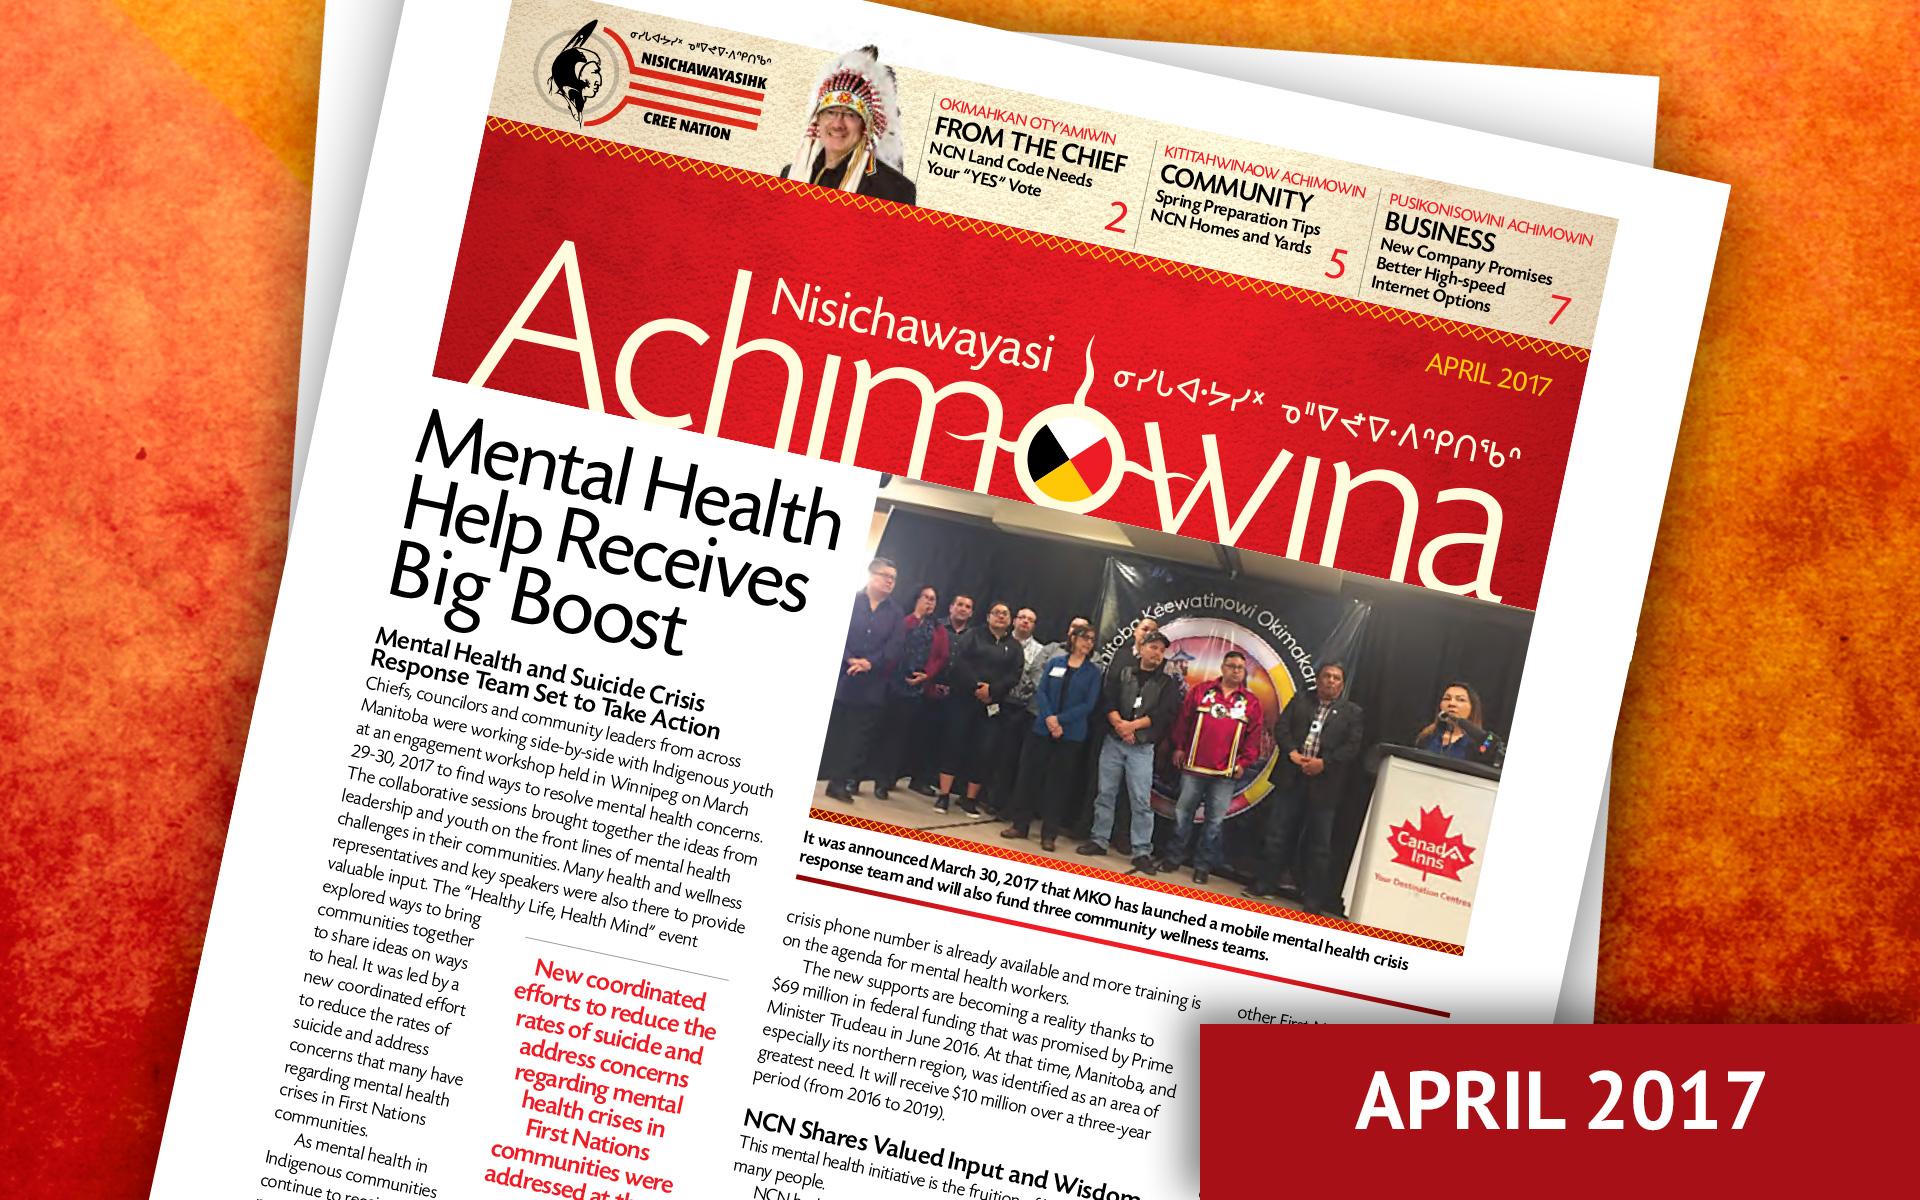 Achimowina April 2017 - Mental Health Help Receives Big Boost